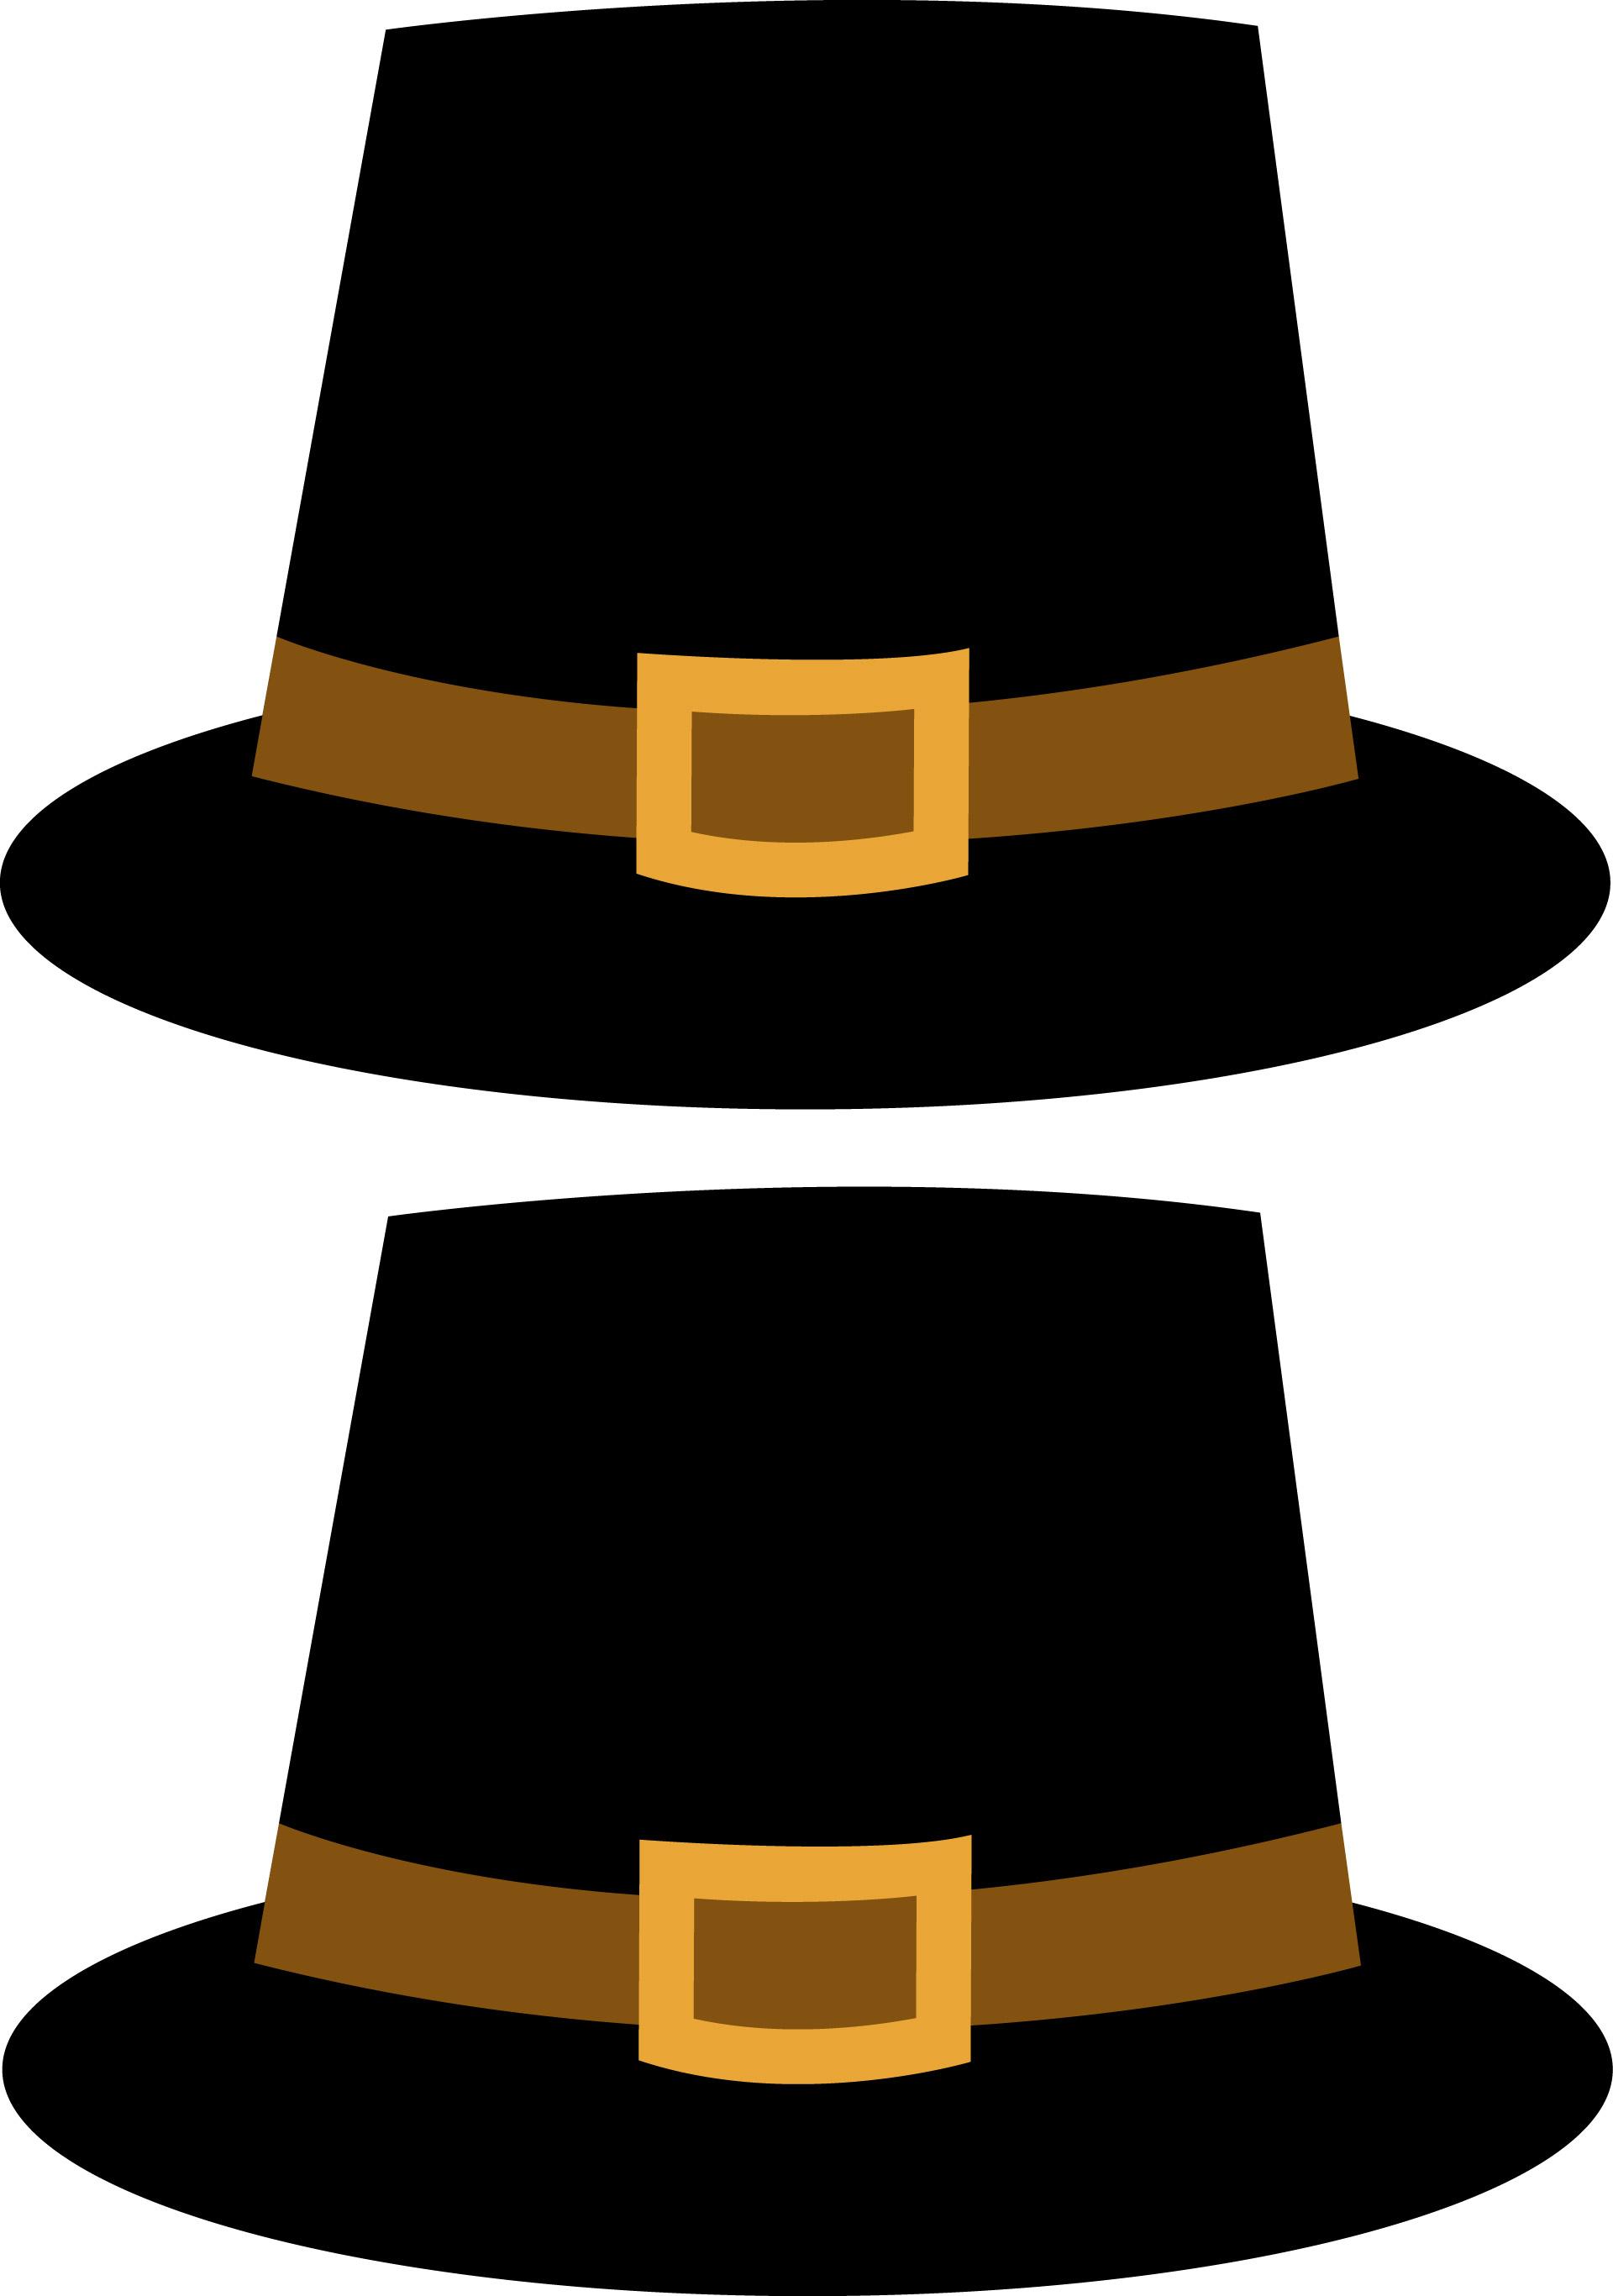 Free Pilgrim Clothes Cliparts, Download Free Clip Art, Free.